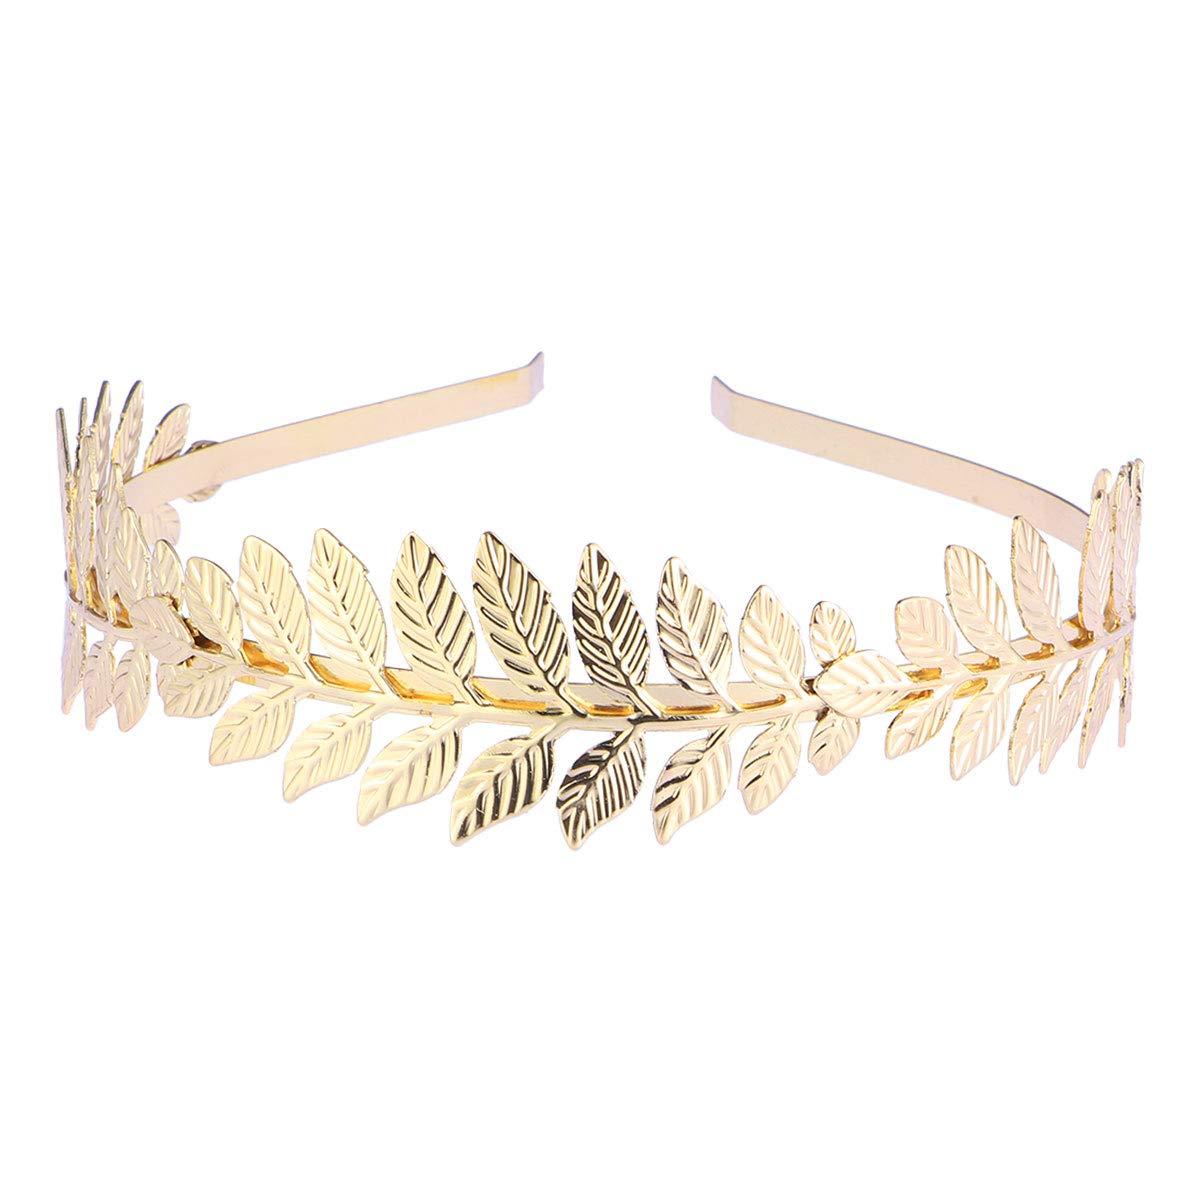 Rose Gold Boho Greek Goddess Inspired Crystal Laurel Leaf Headpiece-Cubic Zirconia CZ Vintage Art Deco Bridal Hair Piece Head Dress-HESTIA